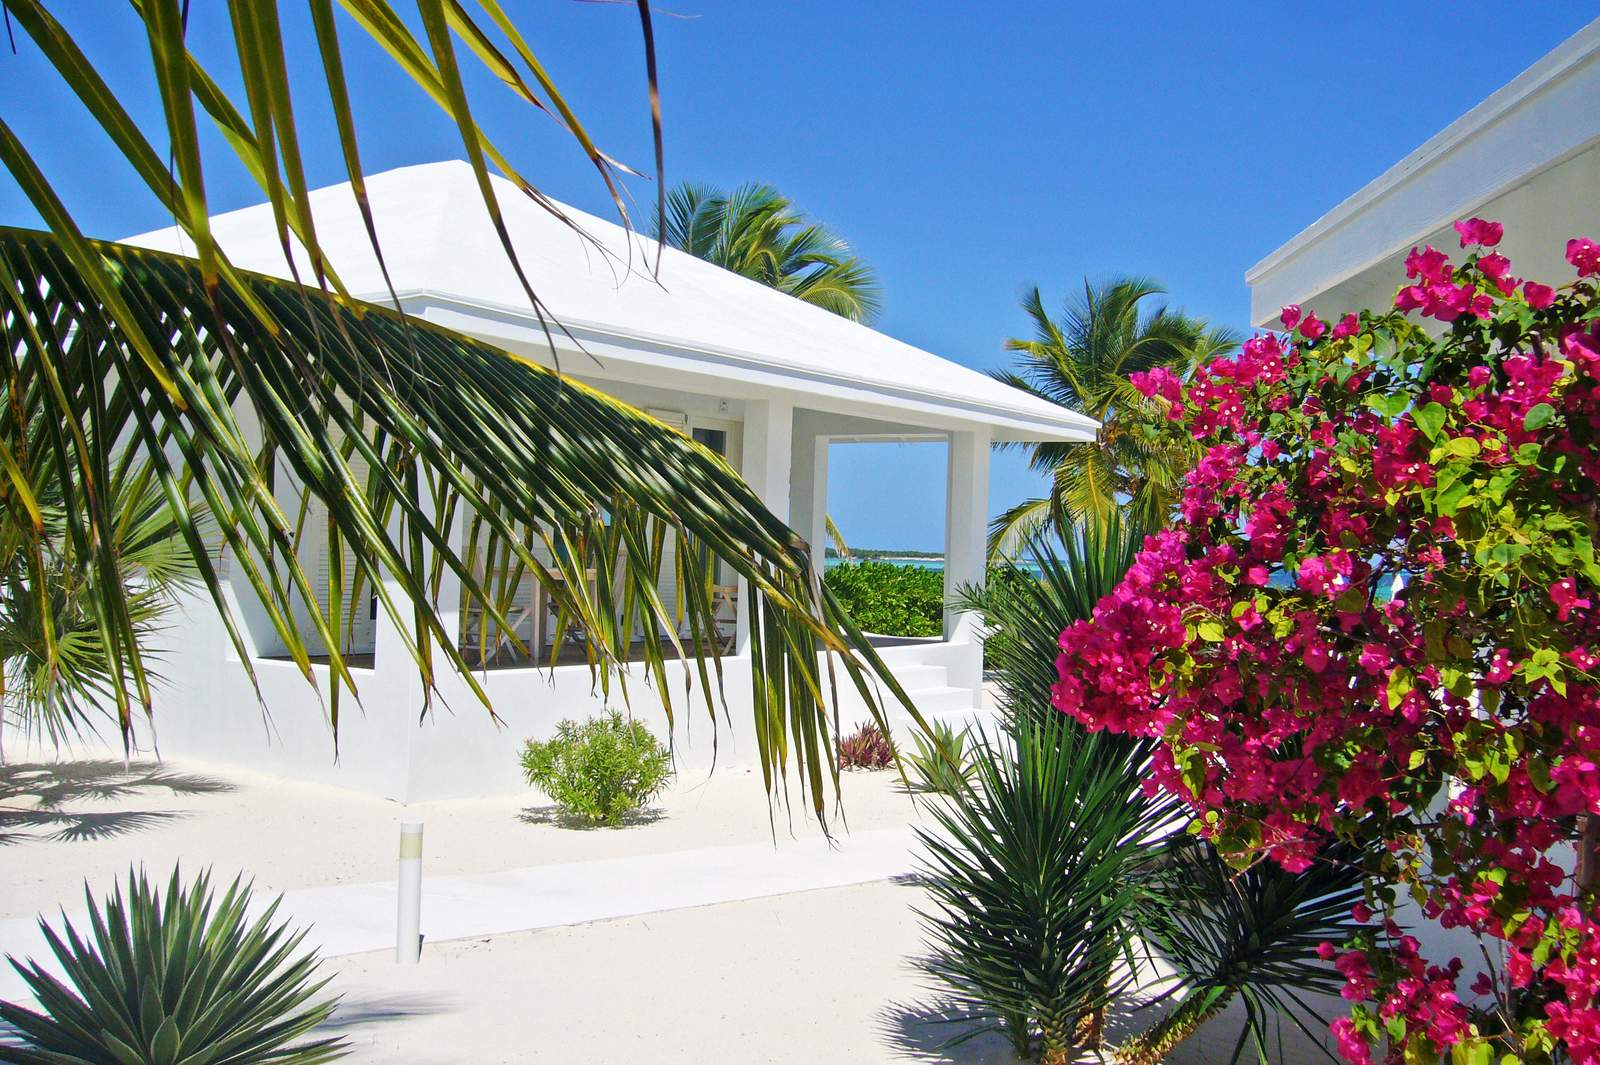 Impression Guanahani Beach Club